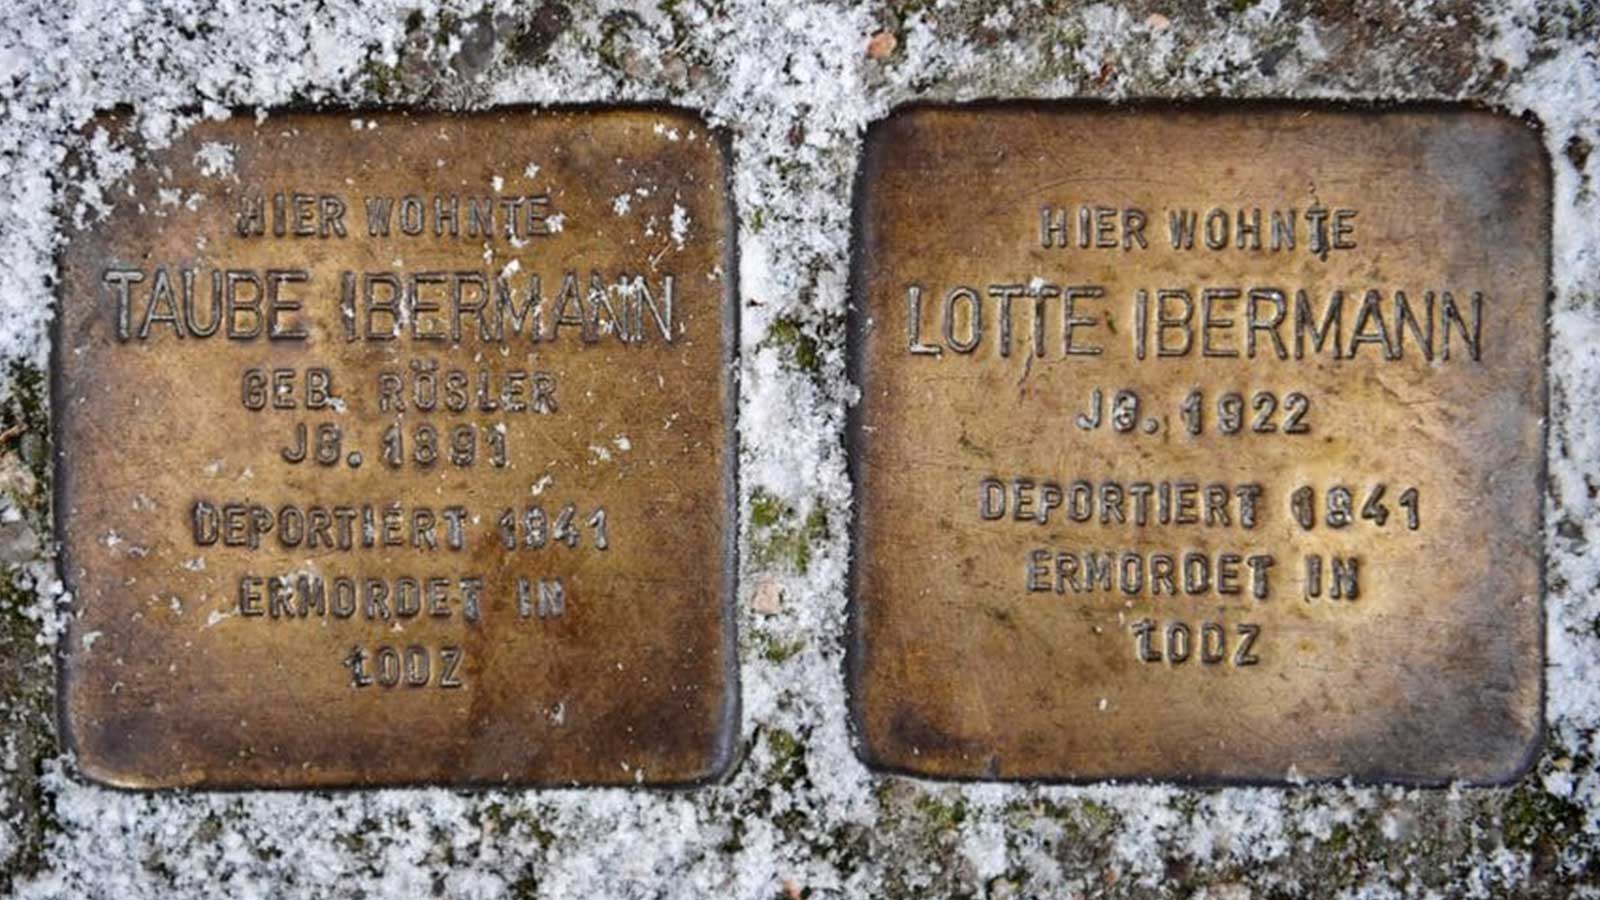 Two Stolpersteine (stumbling blocks) commemorating Holocaust victims